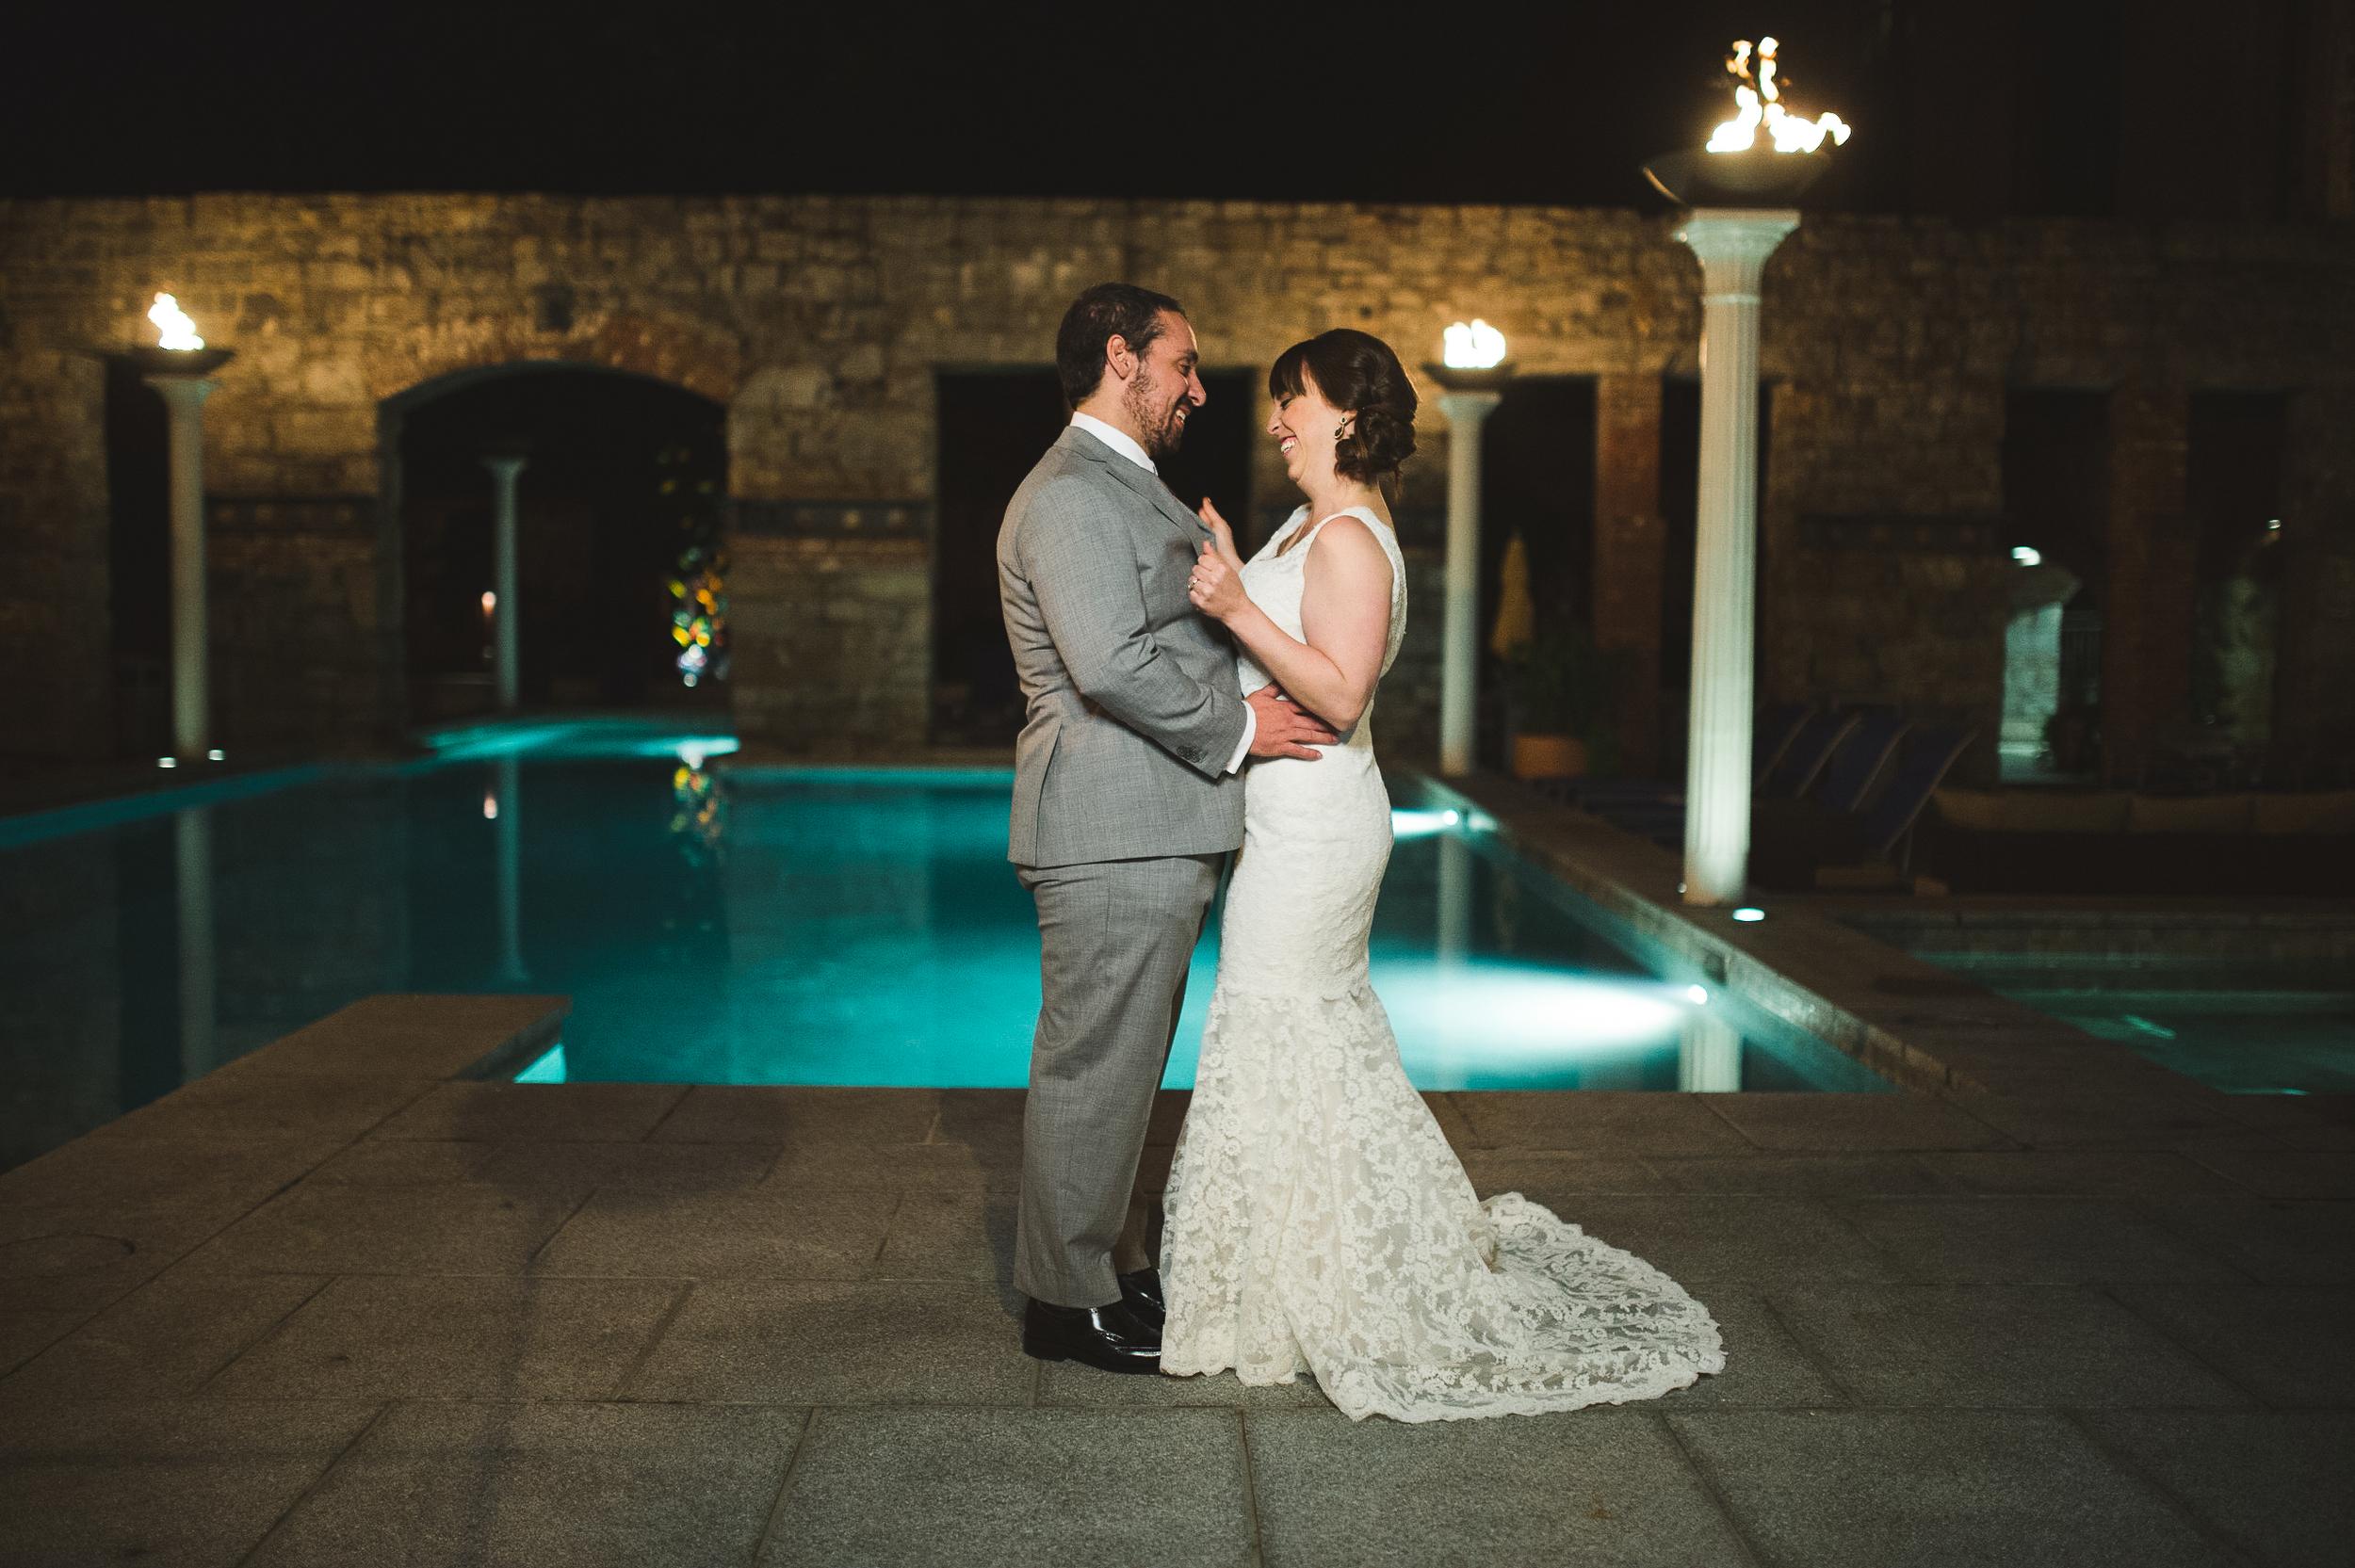 Documentary wedding photographer washington dc Mantas Kubilinskas Photography_-22.jpg